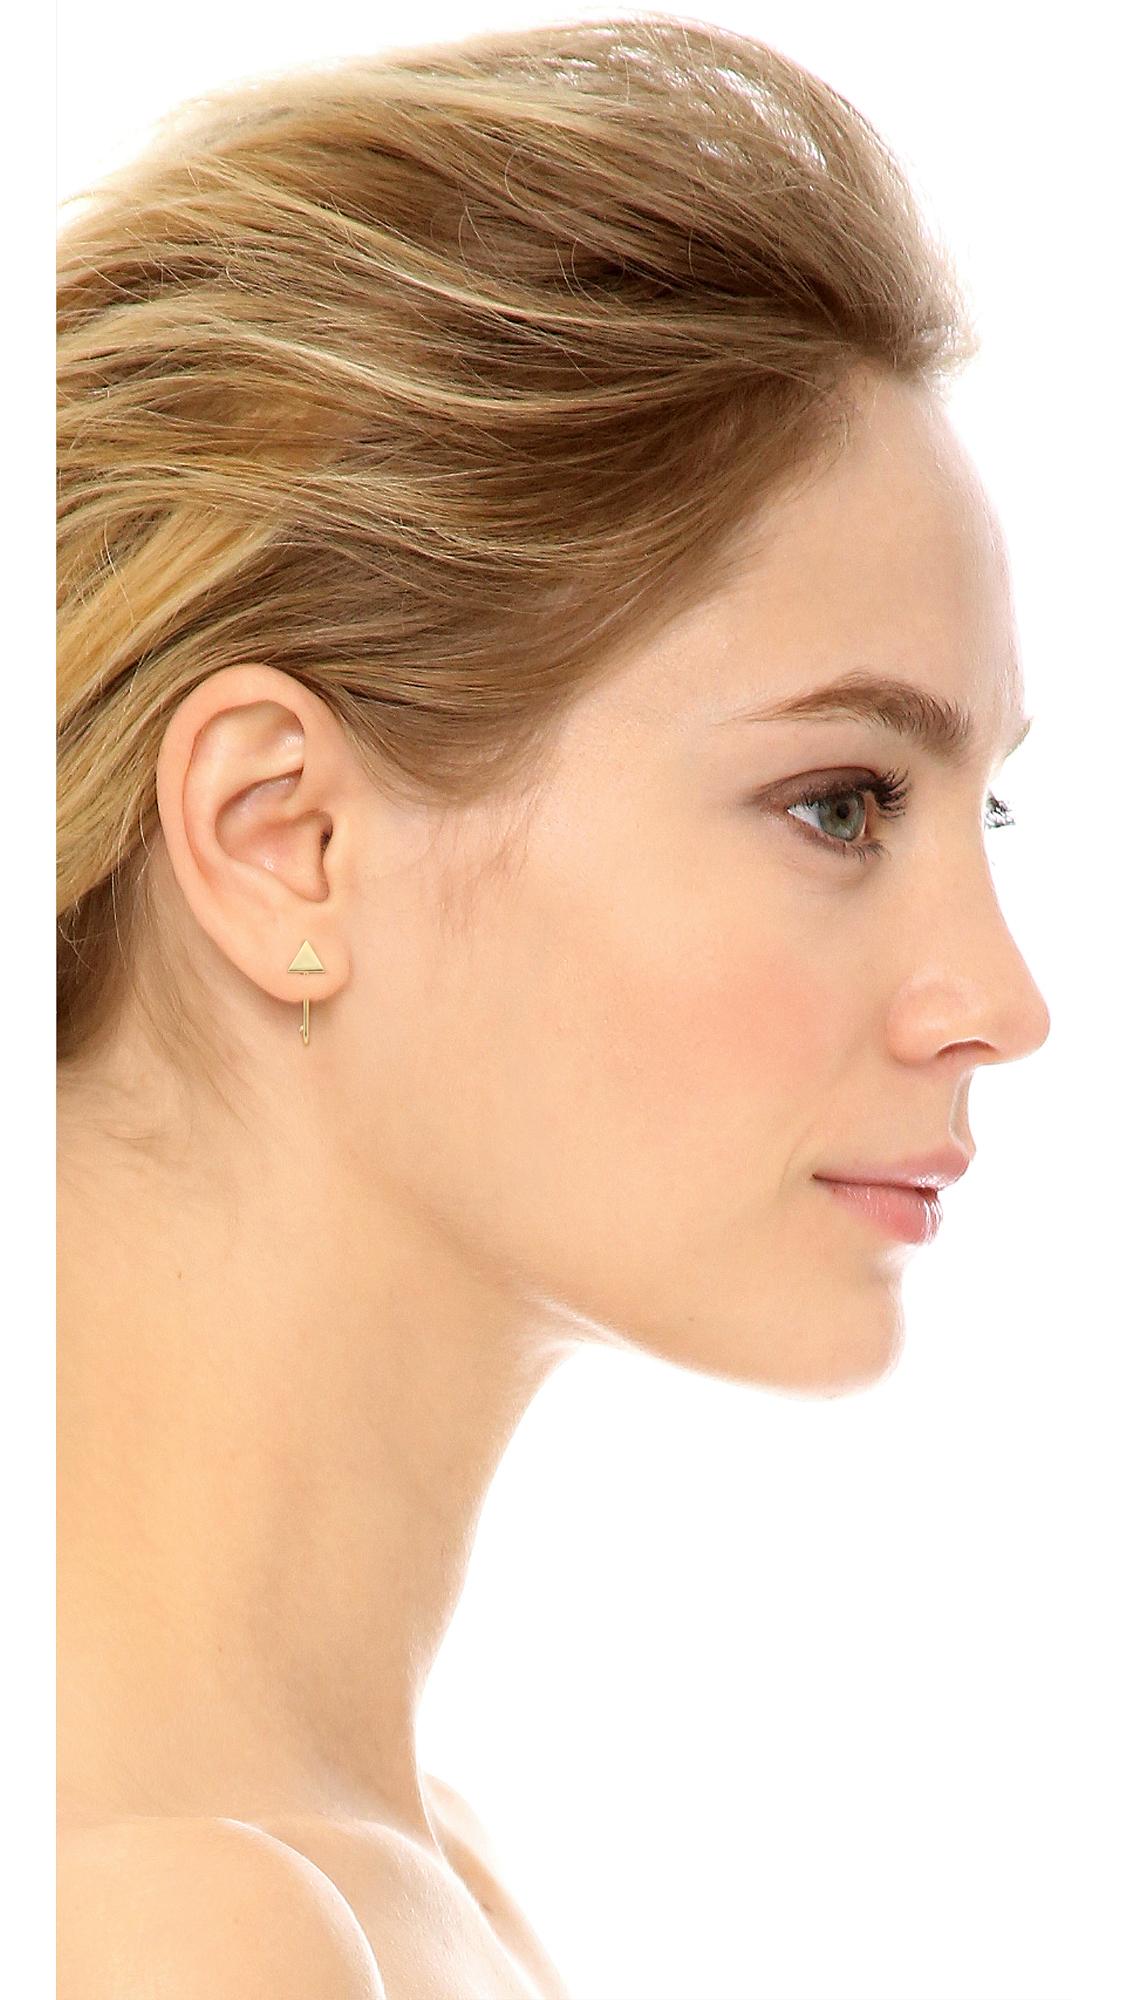 f5ec02745 Madewell Bar Hook Stud Earrings in Metallic - Lyst